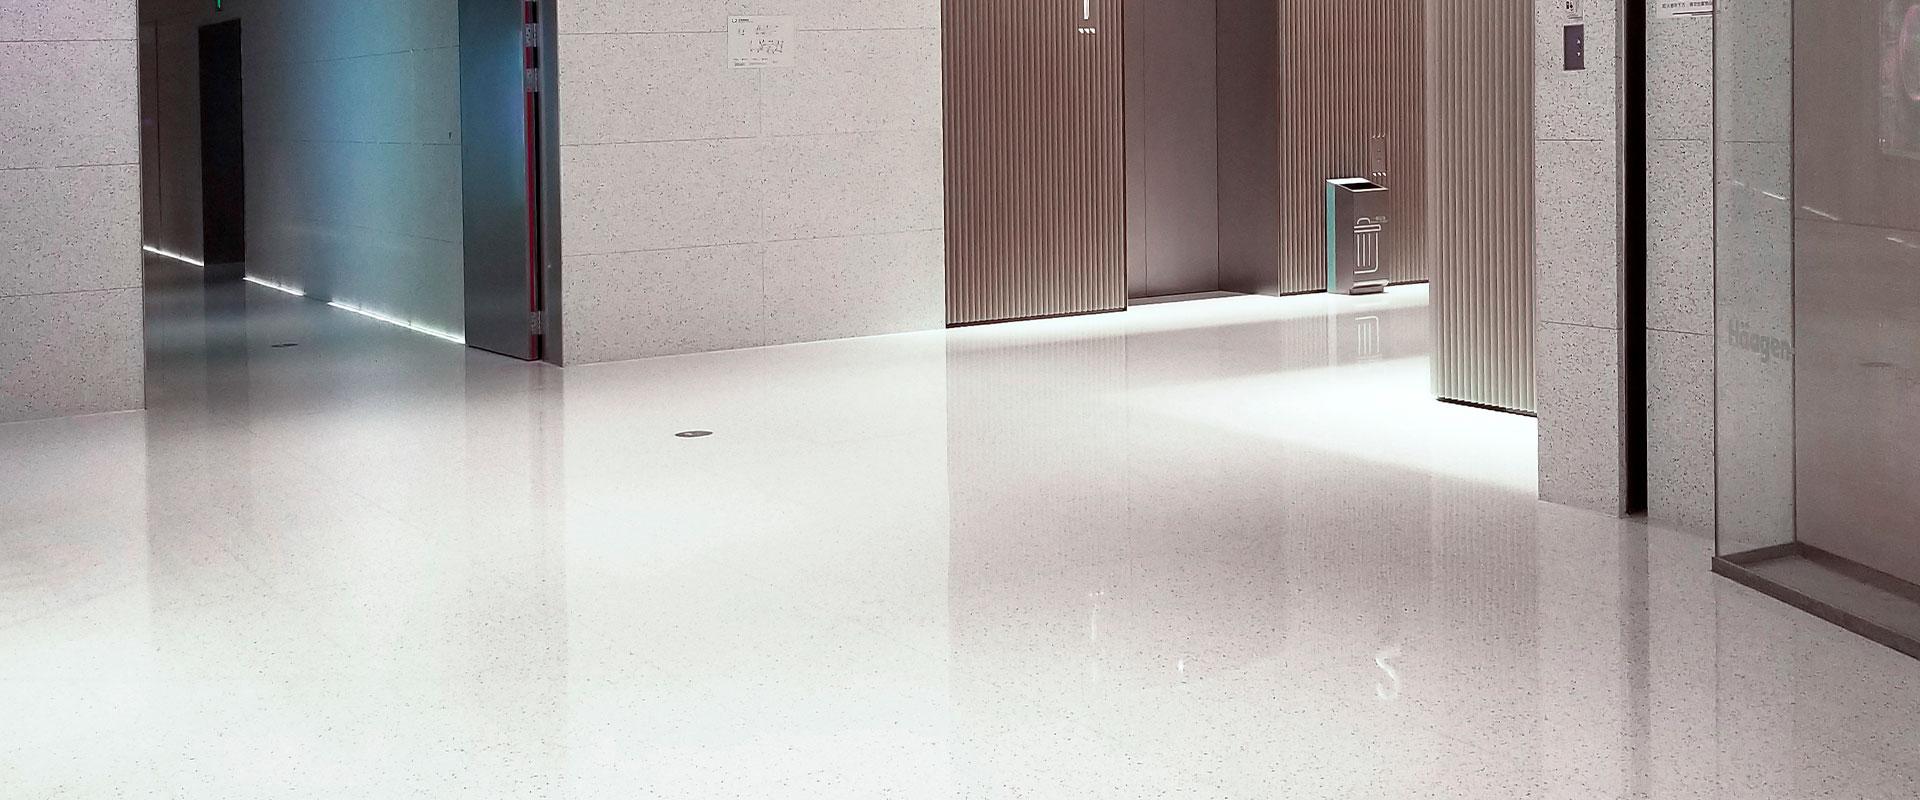 AGGLOTECH-progetto-mall-mixc-crcity-slider-5